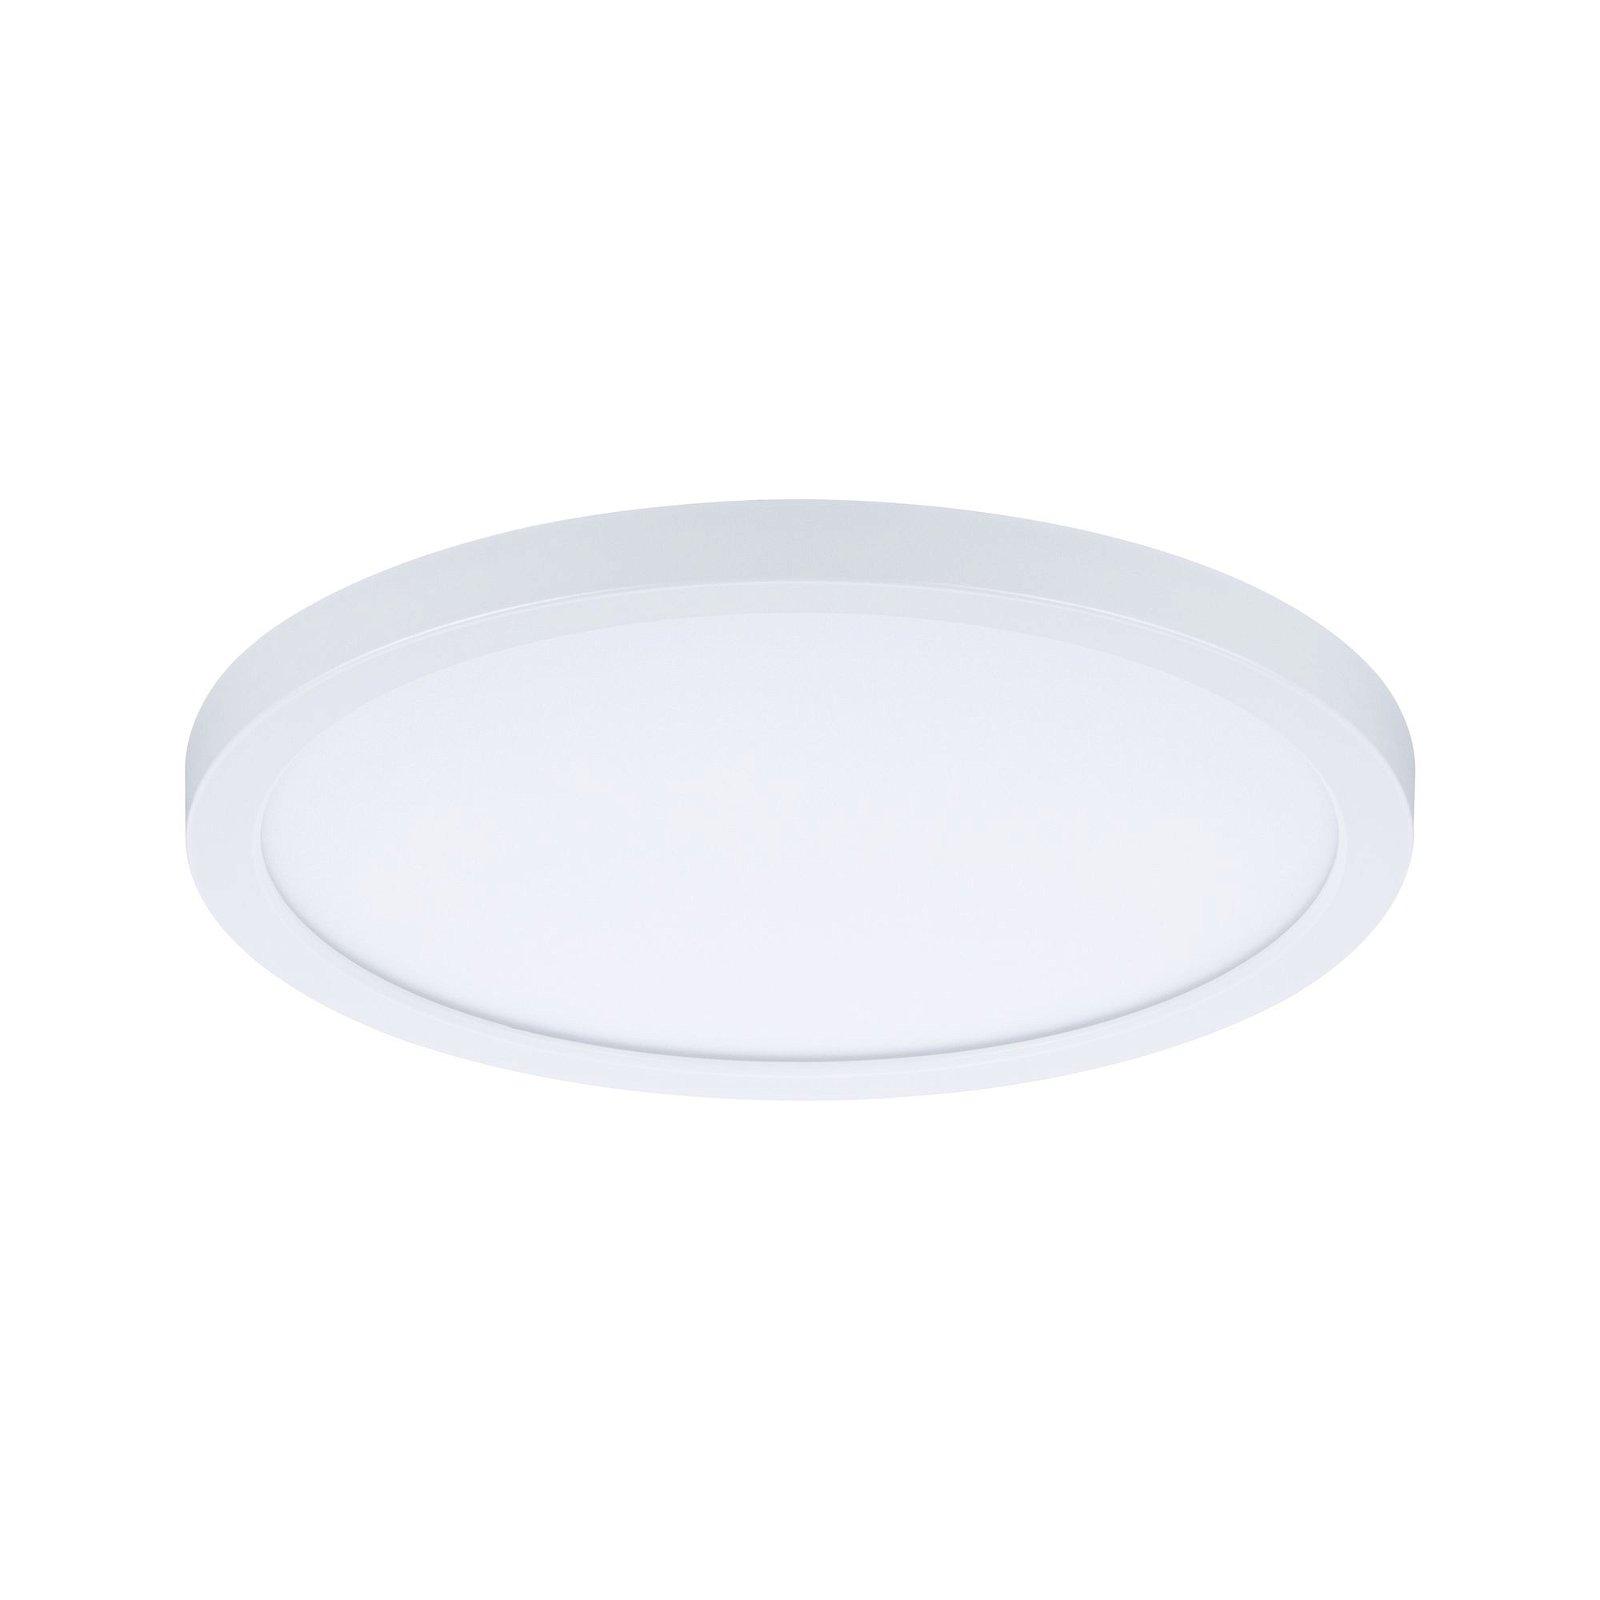 VariFit LED Einbaupanel Smart Home Zigbee Areo IP44 rund 175mm Tunable White Weiß